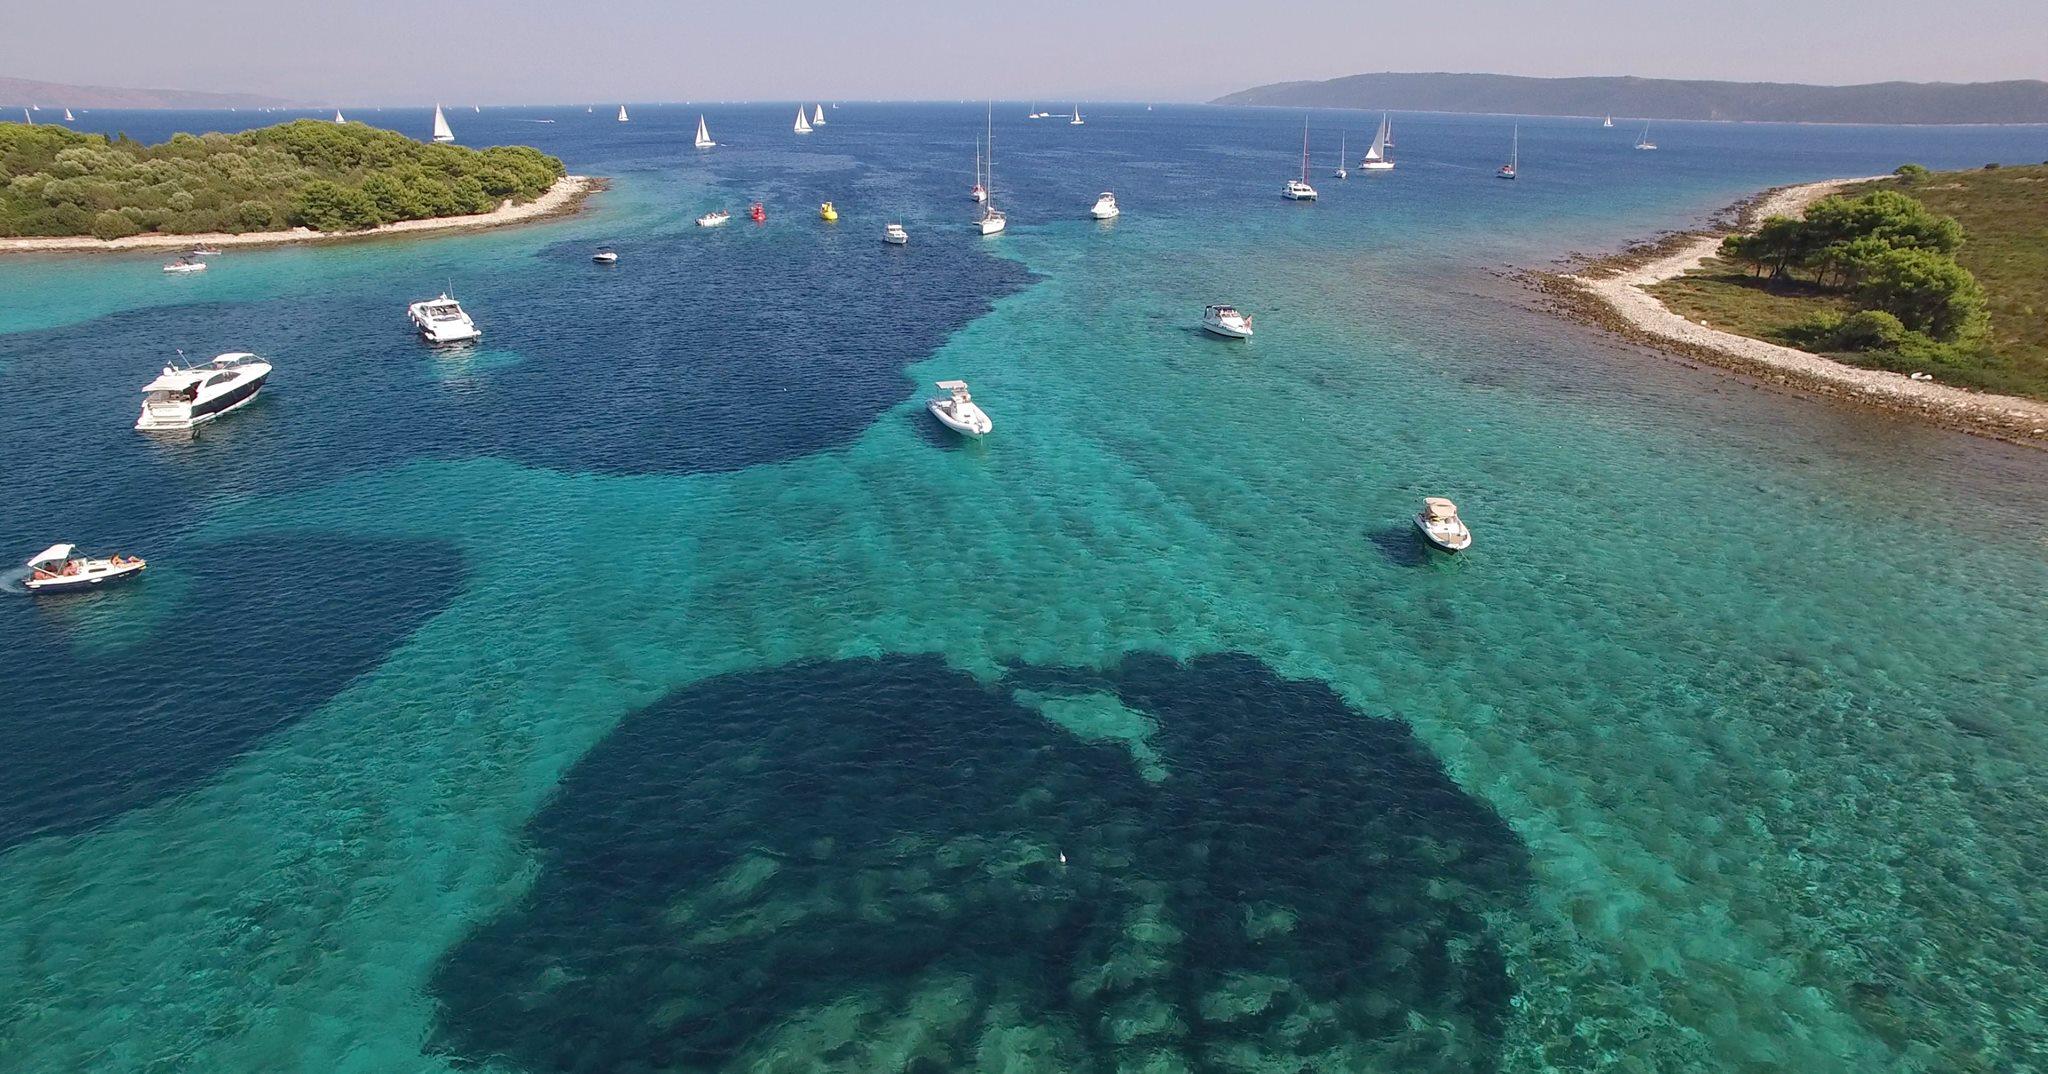 Insbesondere die Blaue Lagune mit Namen Krknjasi begeistert viele Kroatien-Besucher mit dem klaren Meerwasser